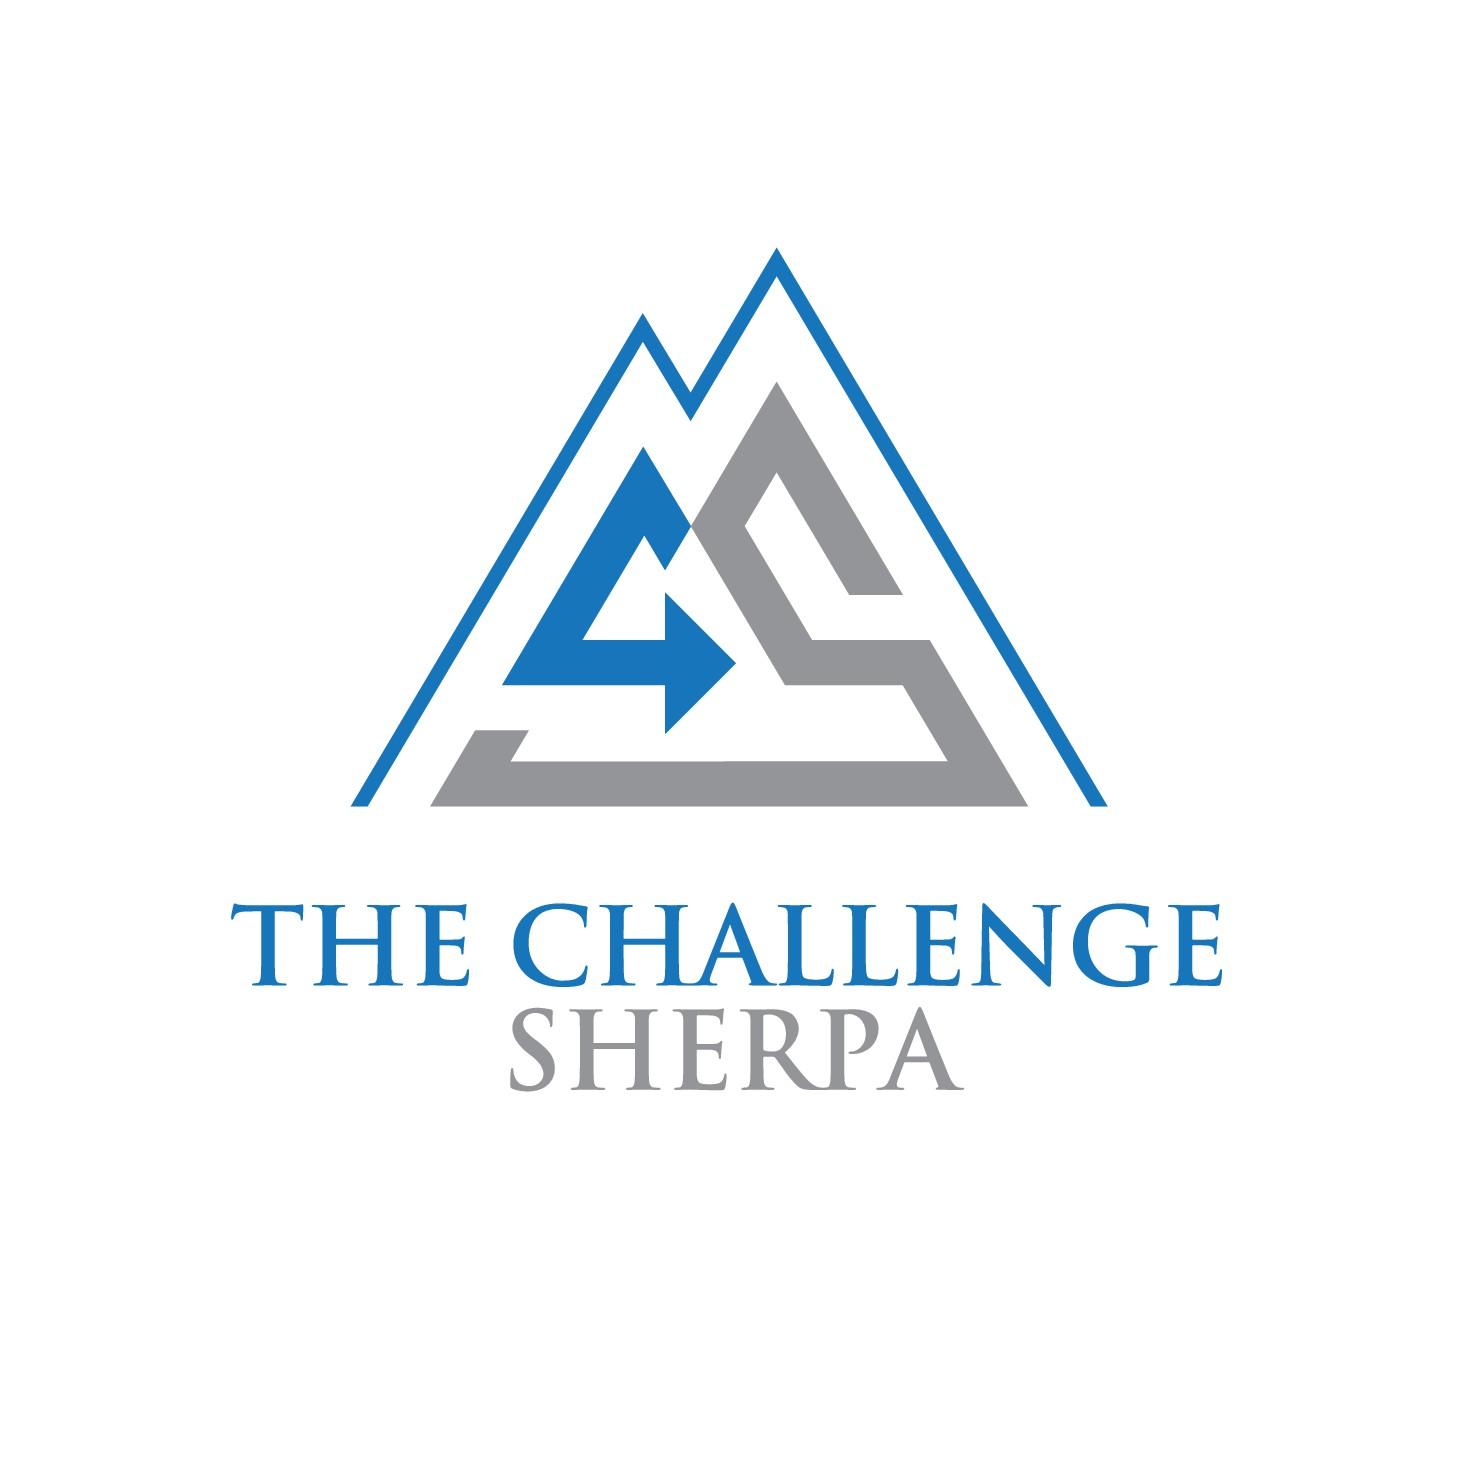 The Challenge Sherpa